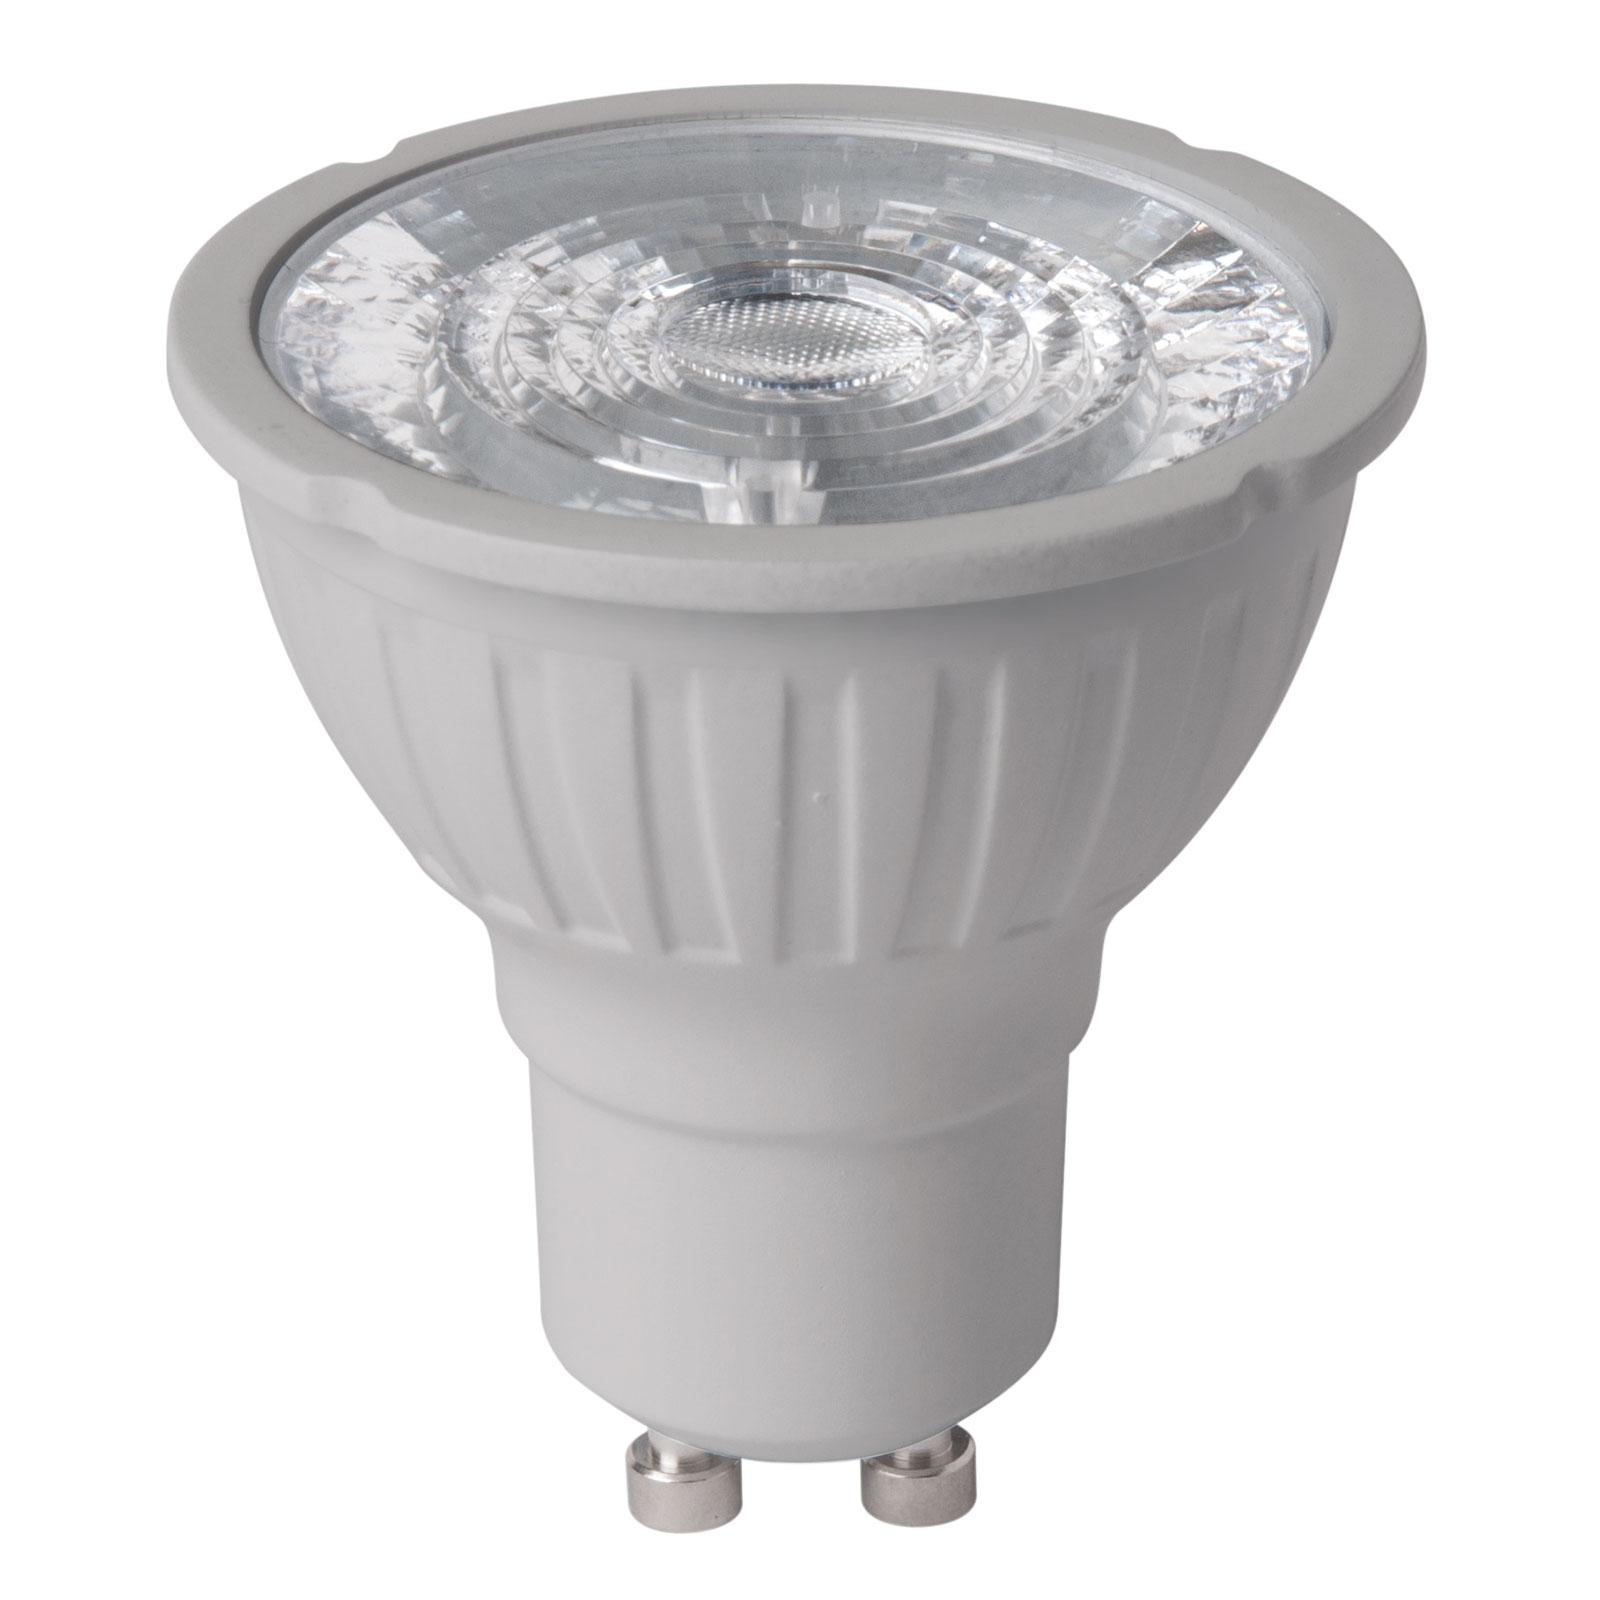 LED-Reflektor GU10 dual beam 5W 2.800K